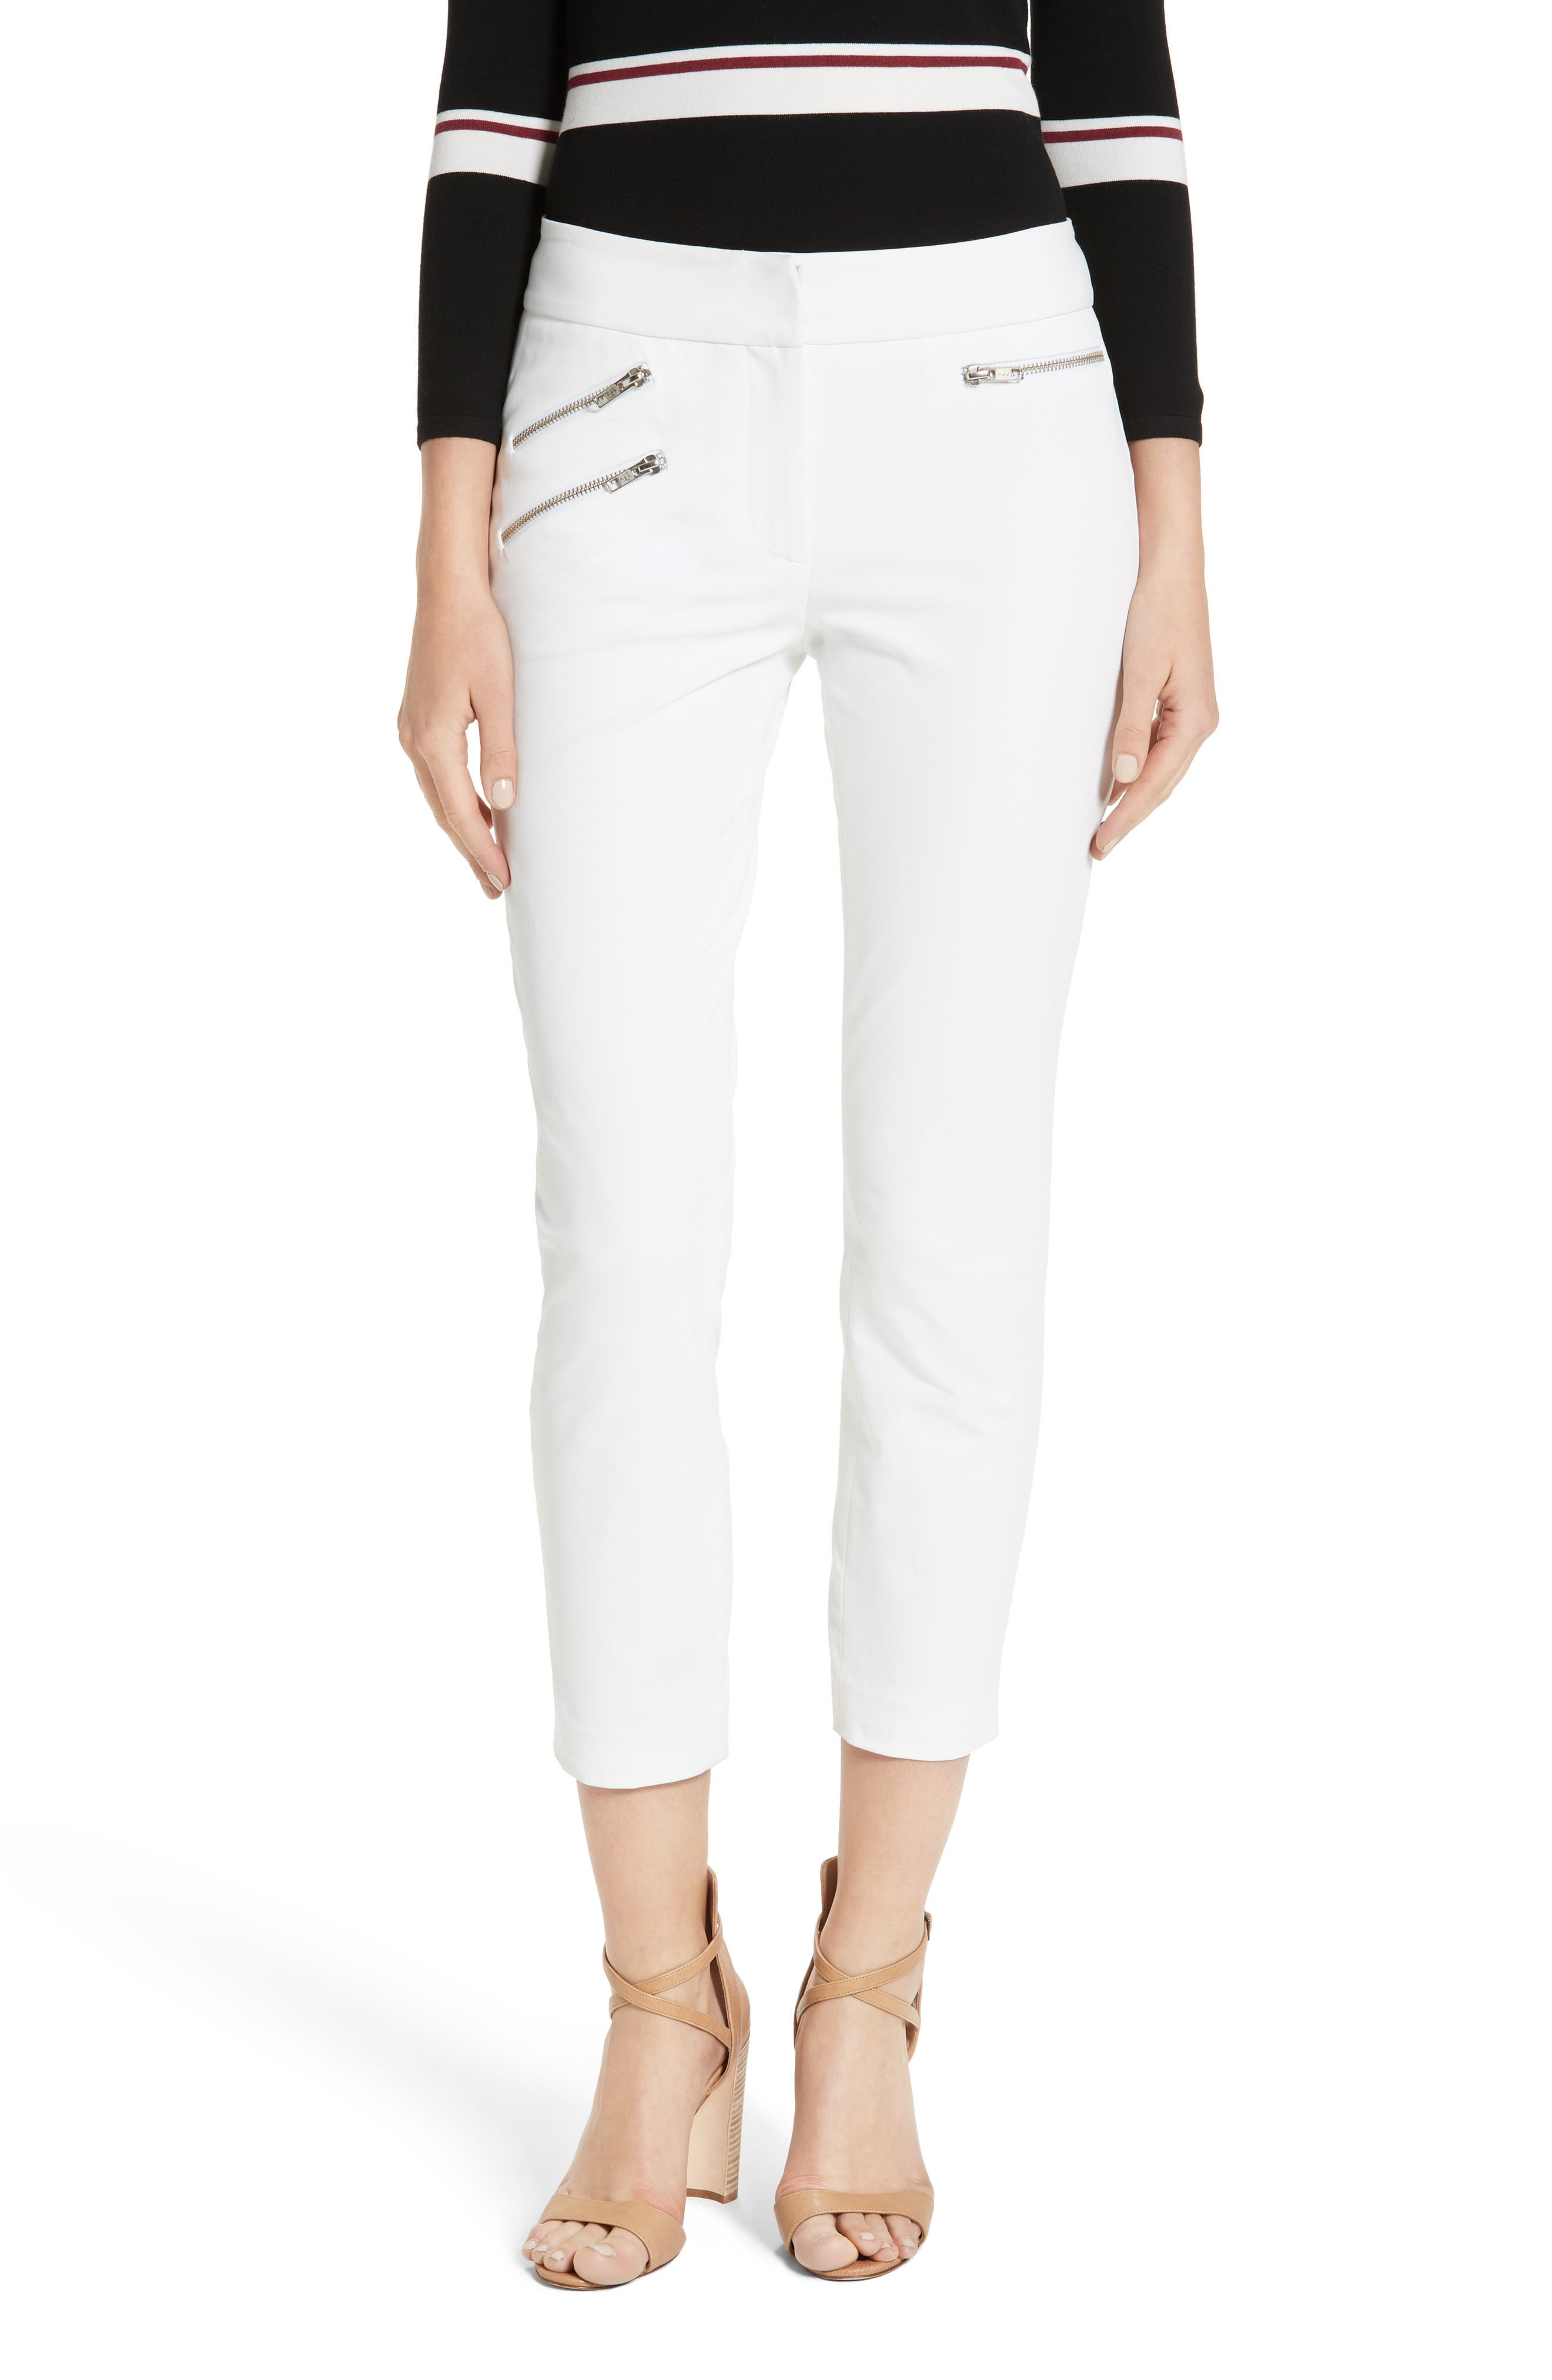 Roxy Crop Pants,                             Main thumbnail 1, color,                             WHITE